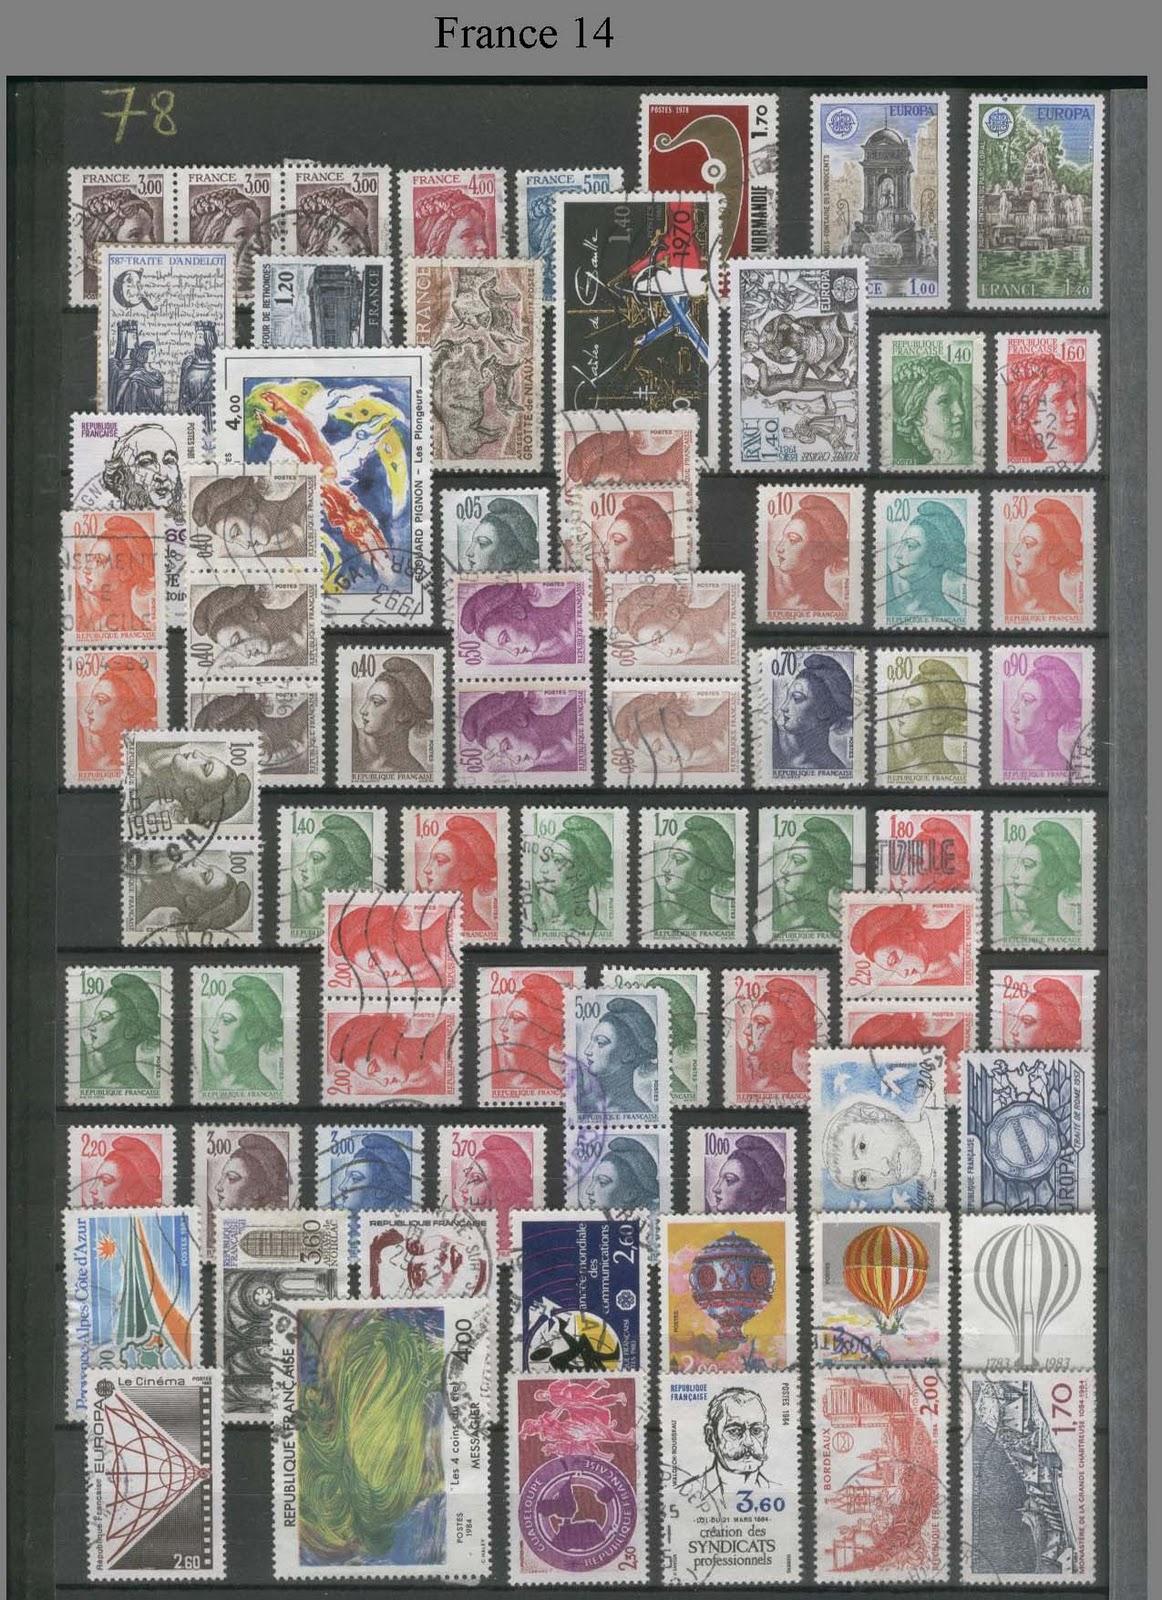 ma collection et plus encore ma collection de timbres poste france. Black Bedroom Furniture Sets. Home Design Ideas